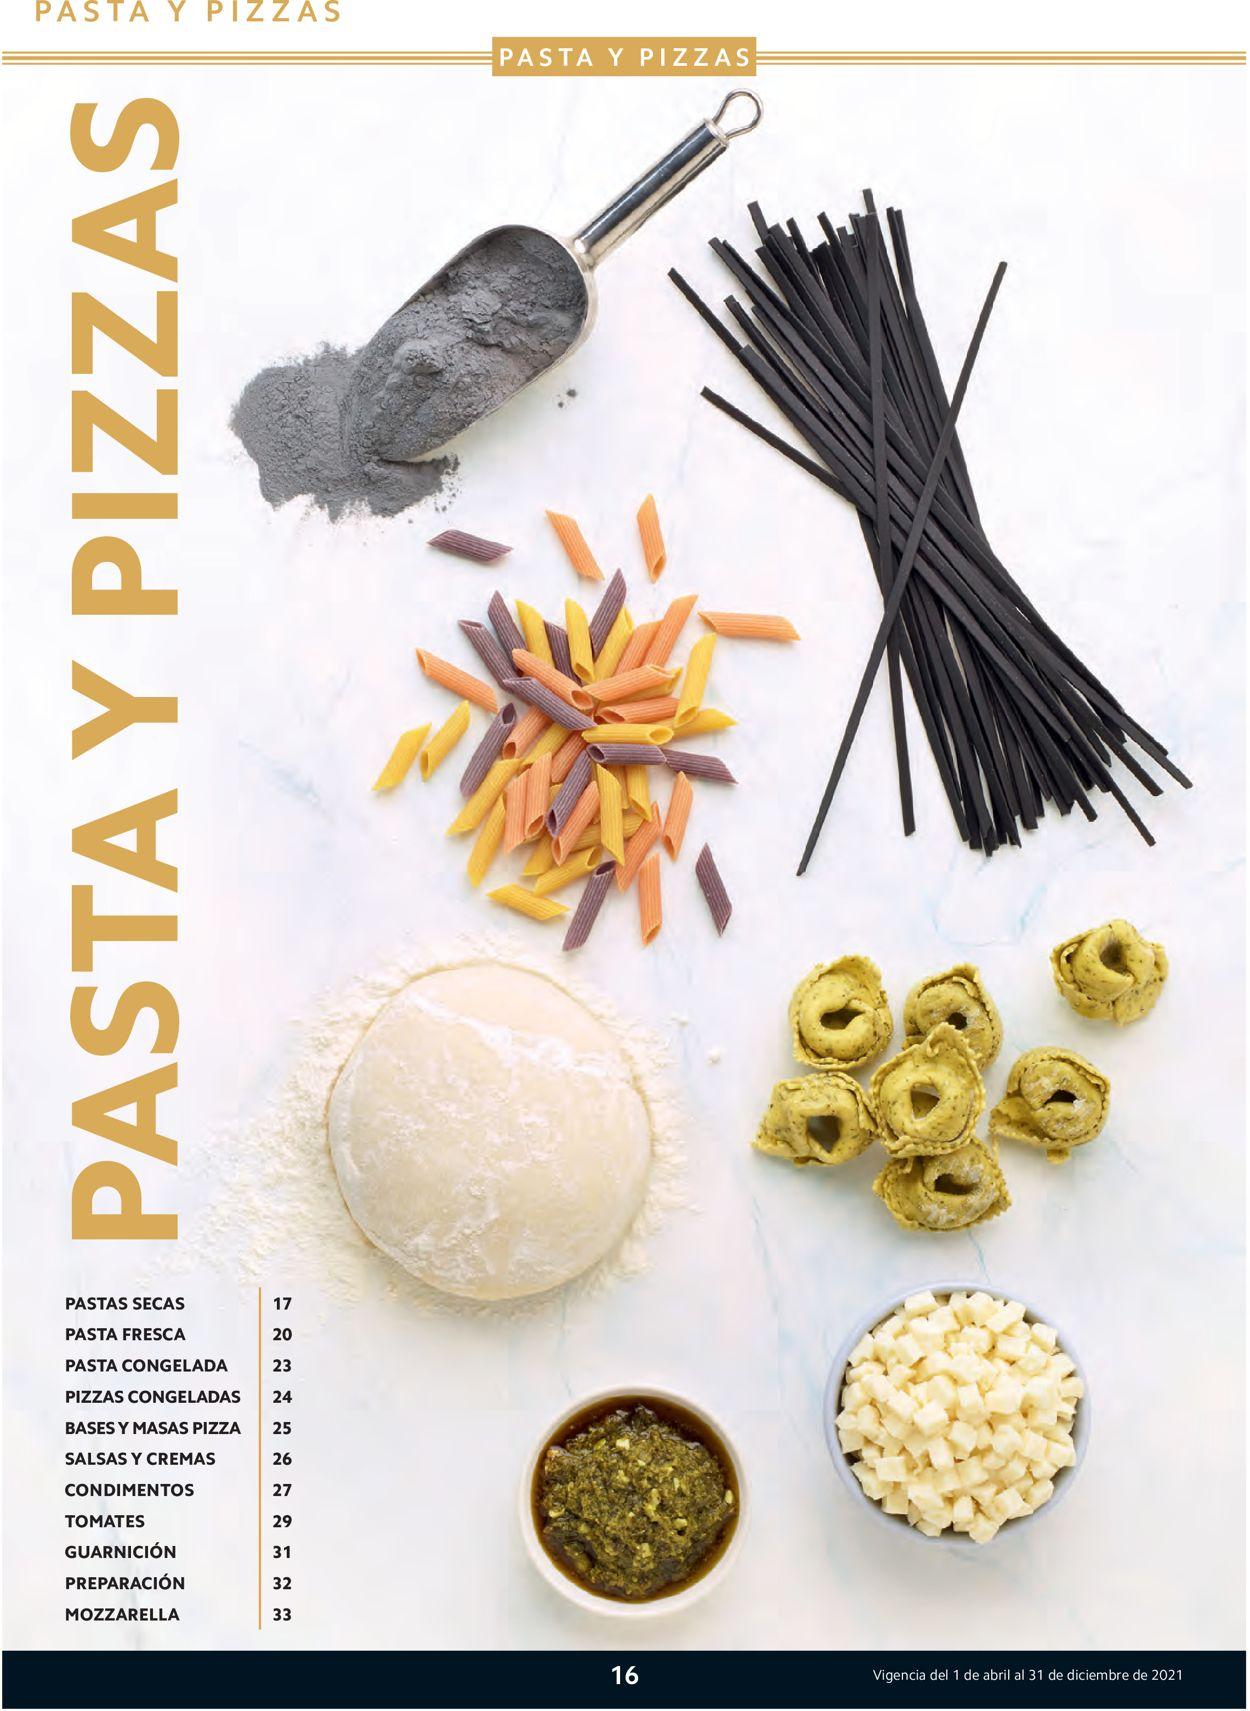 Makro Especial Italia Folleto - 01.04-31.12.2021 (Página 16)